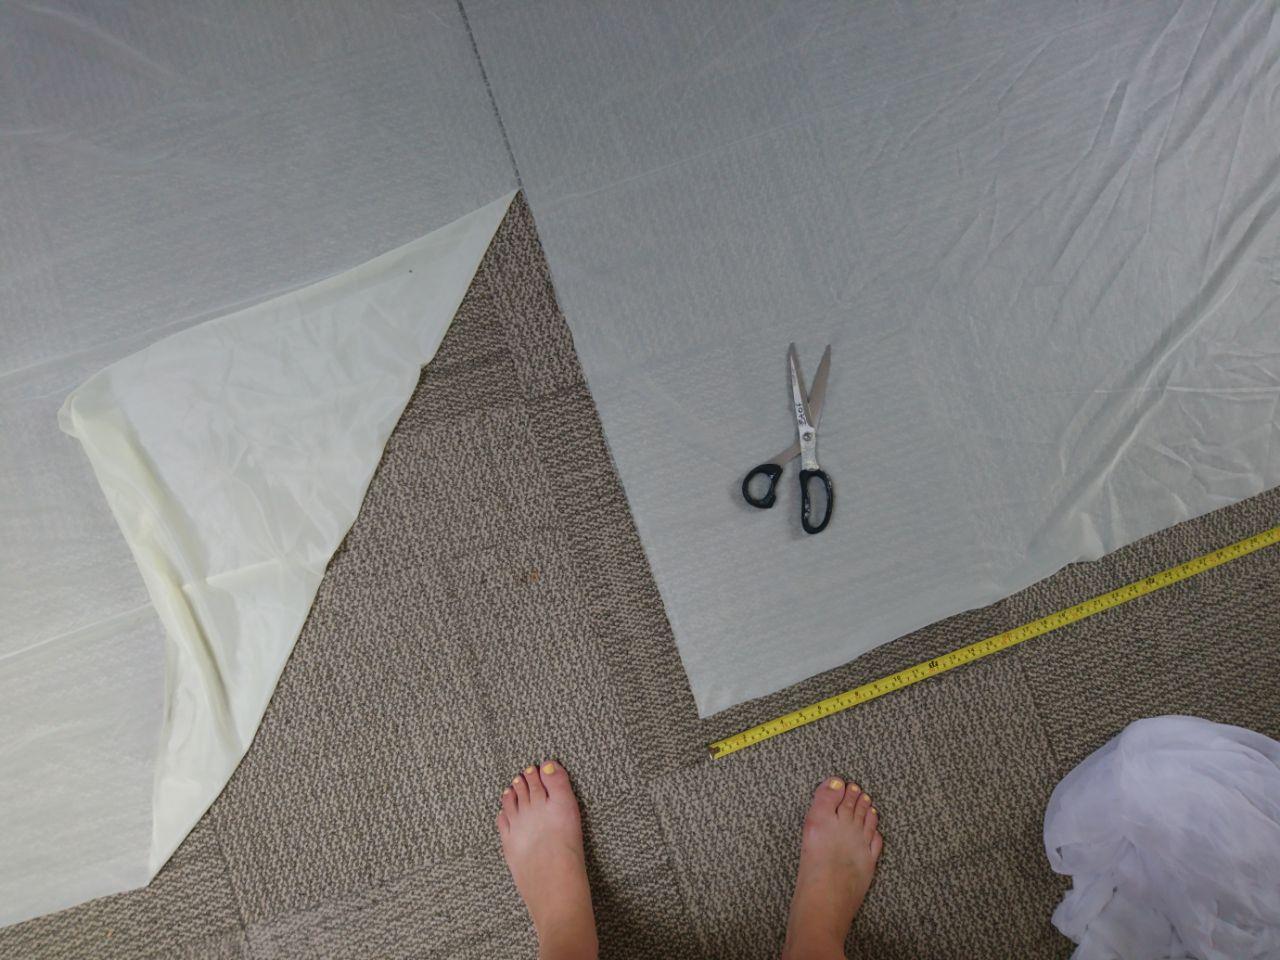 Cutting fabric for my Mushroom, MOAM x Paradiso